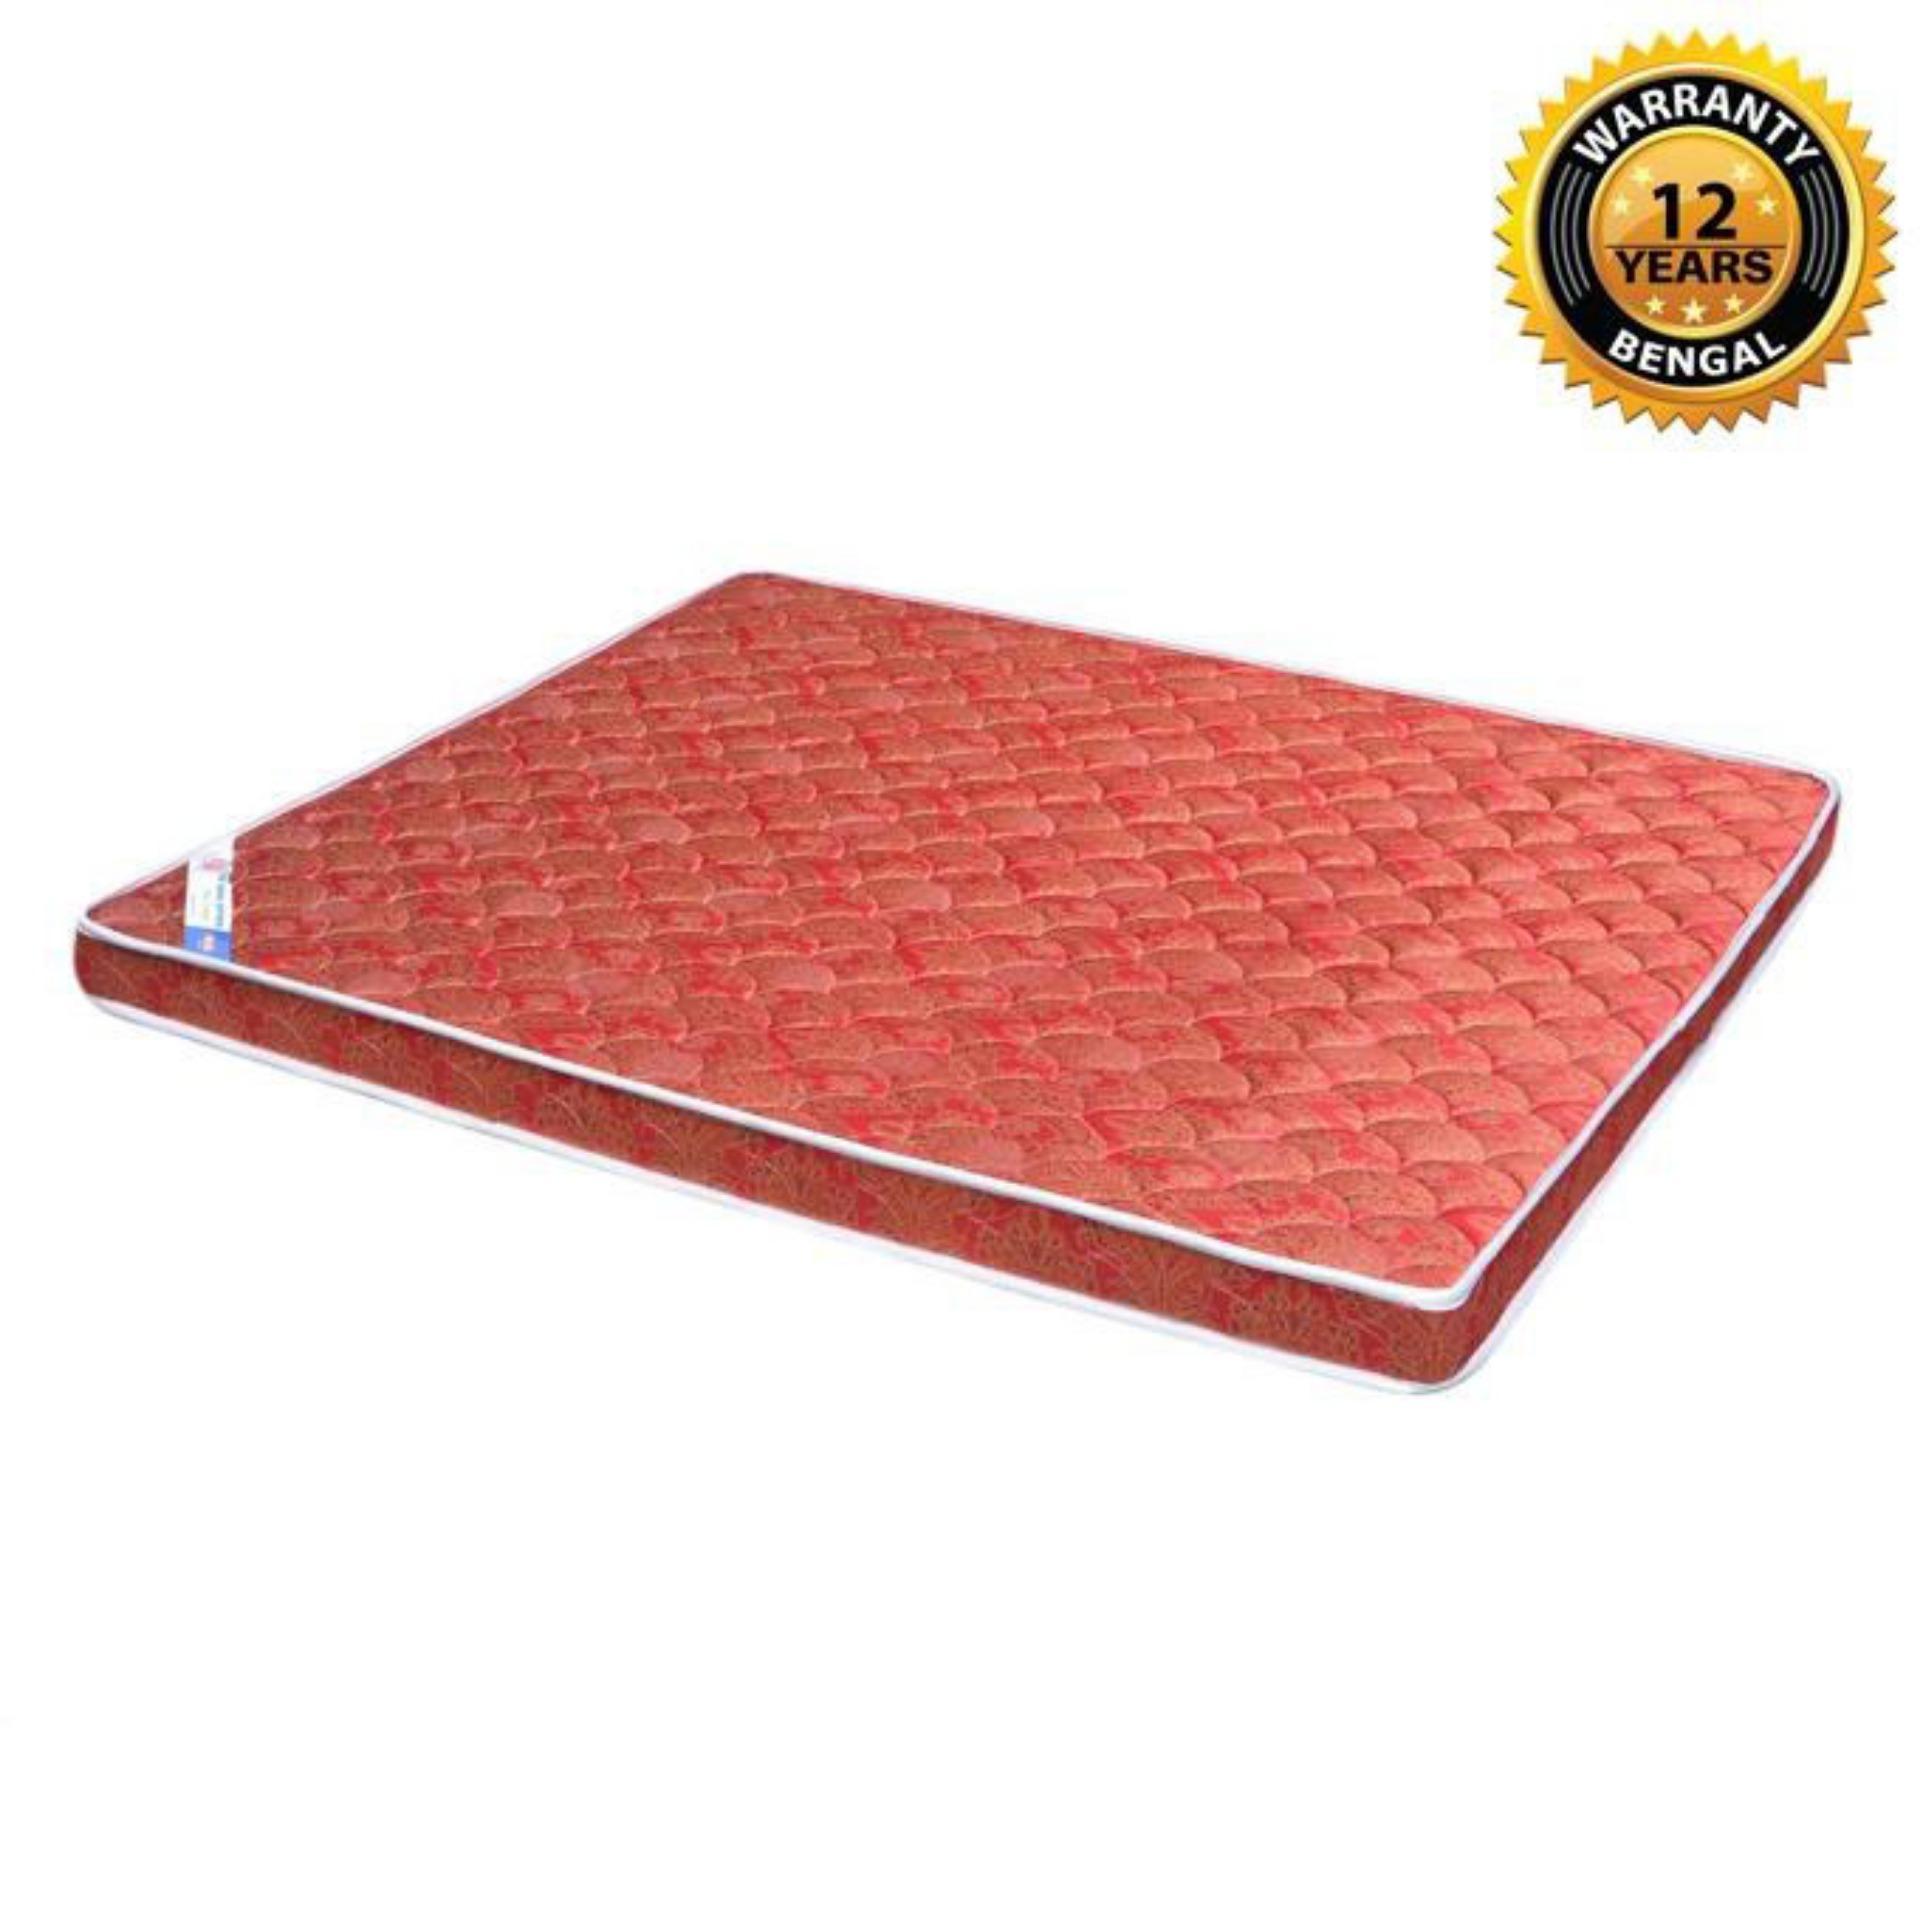 "Bengal Spring Mattress (84""x66""x8"") - Red"